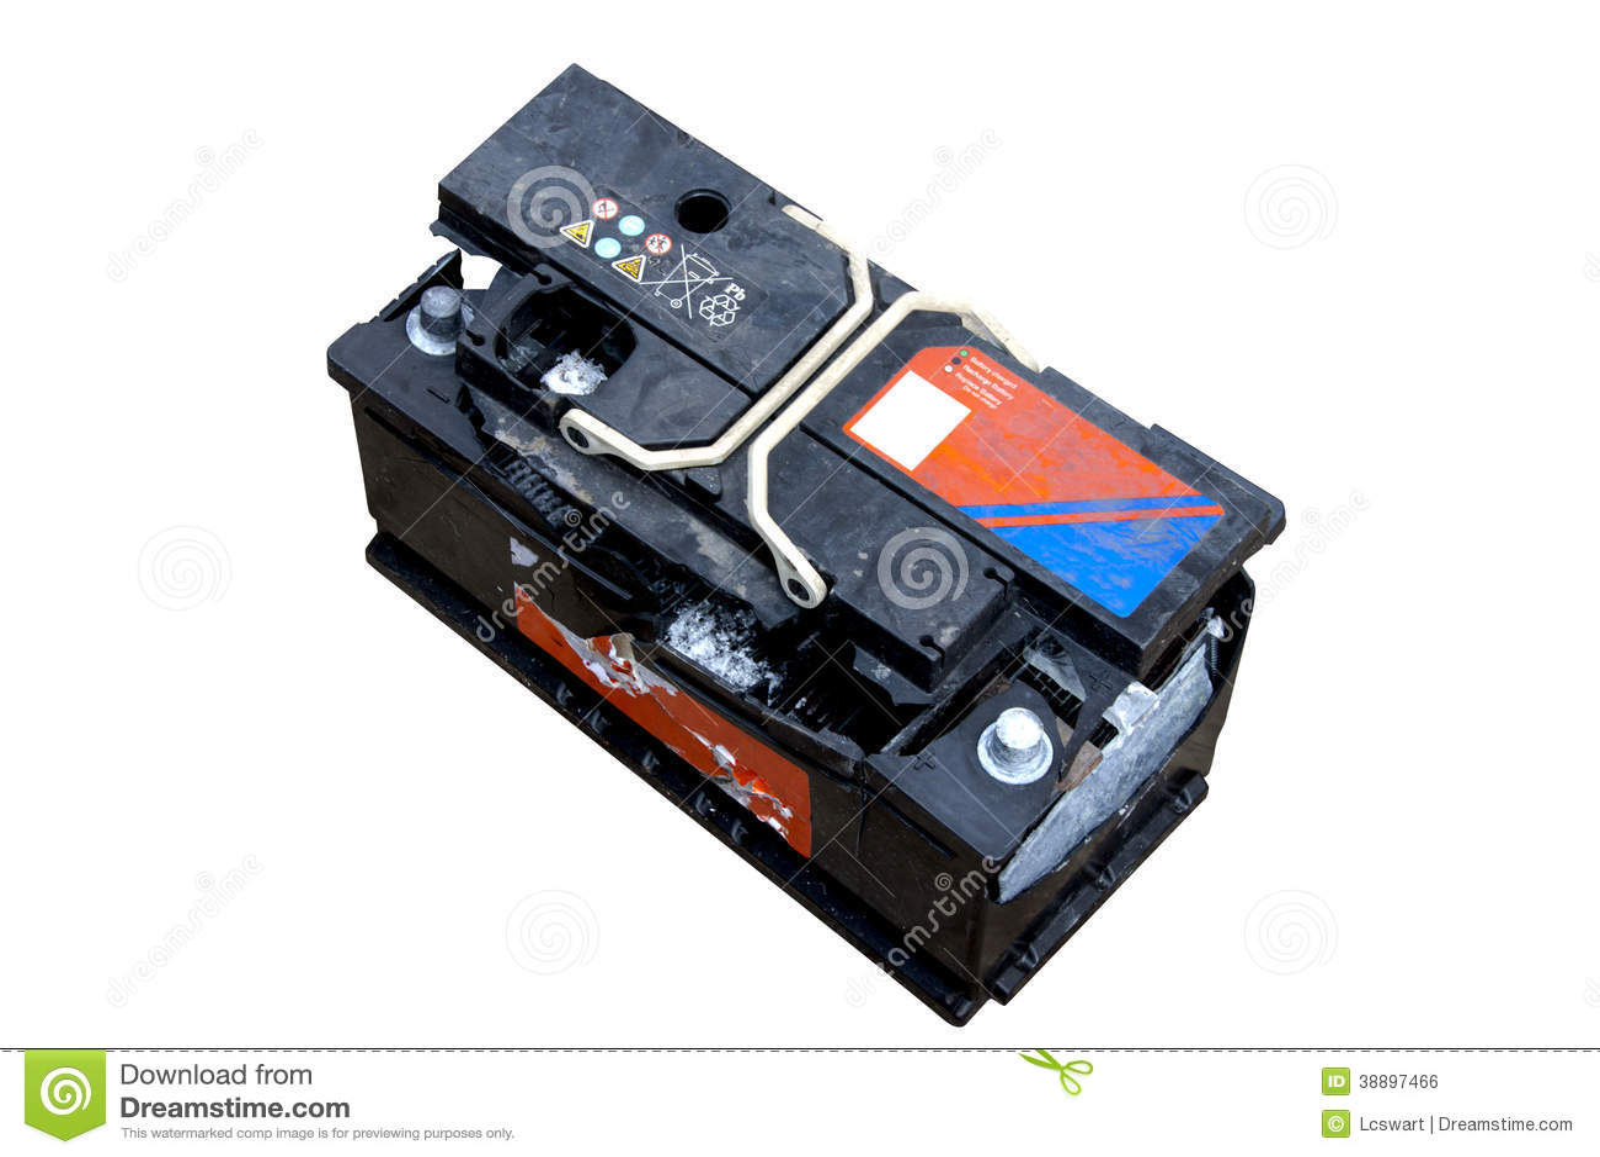 Auto battery overcharging regulator